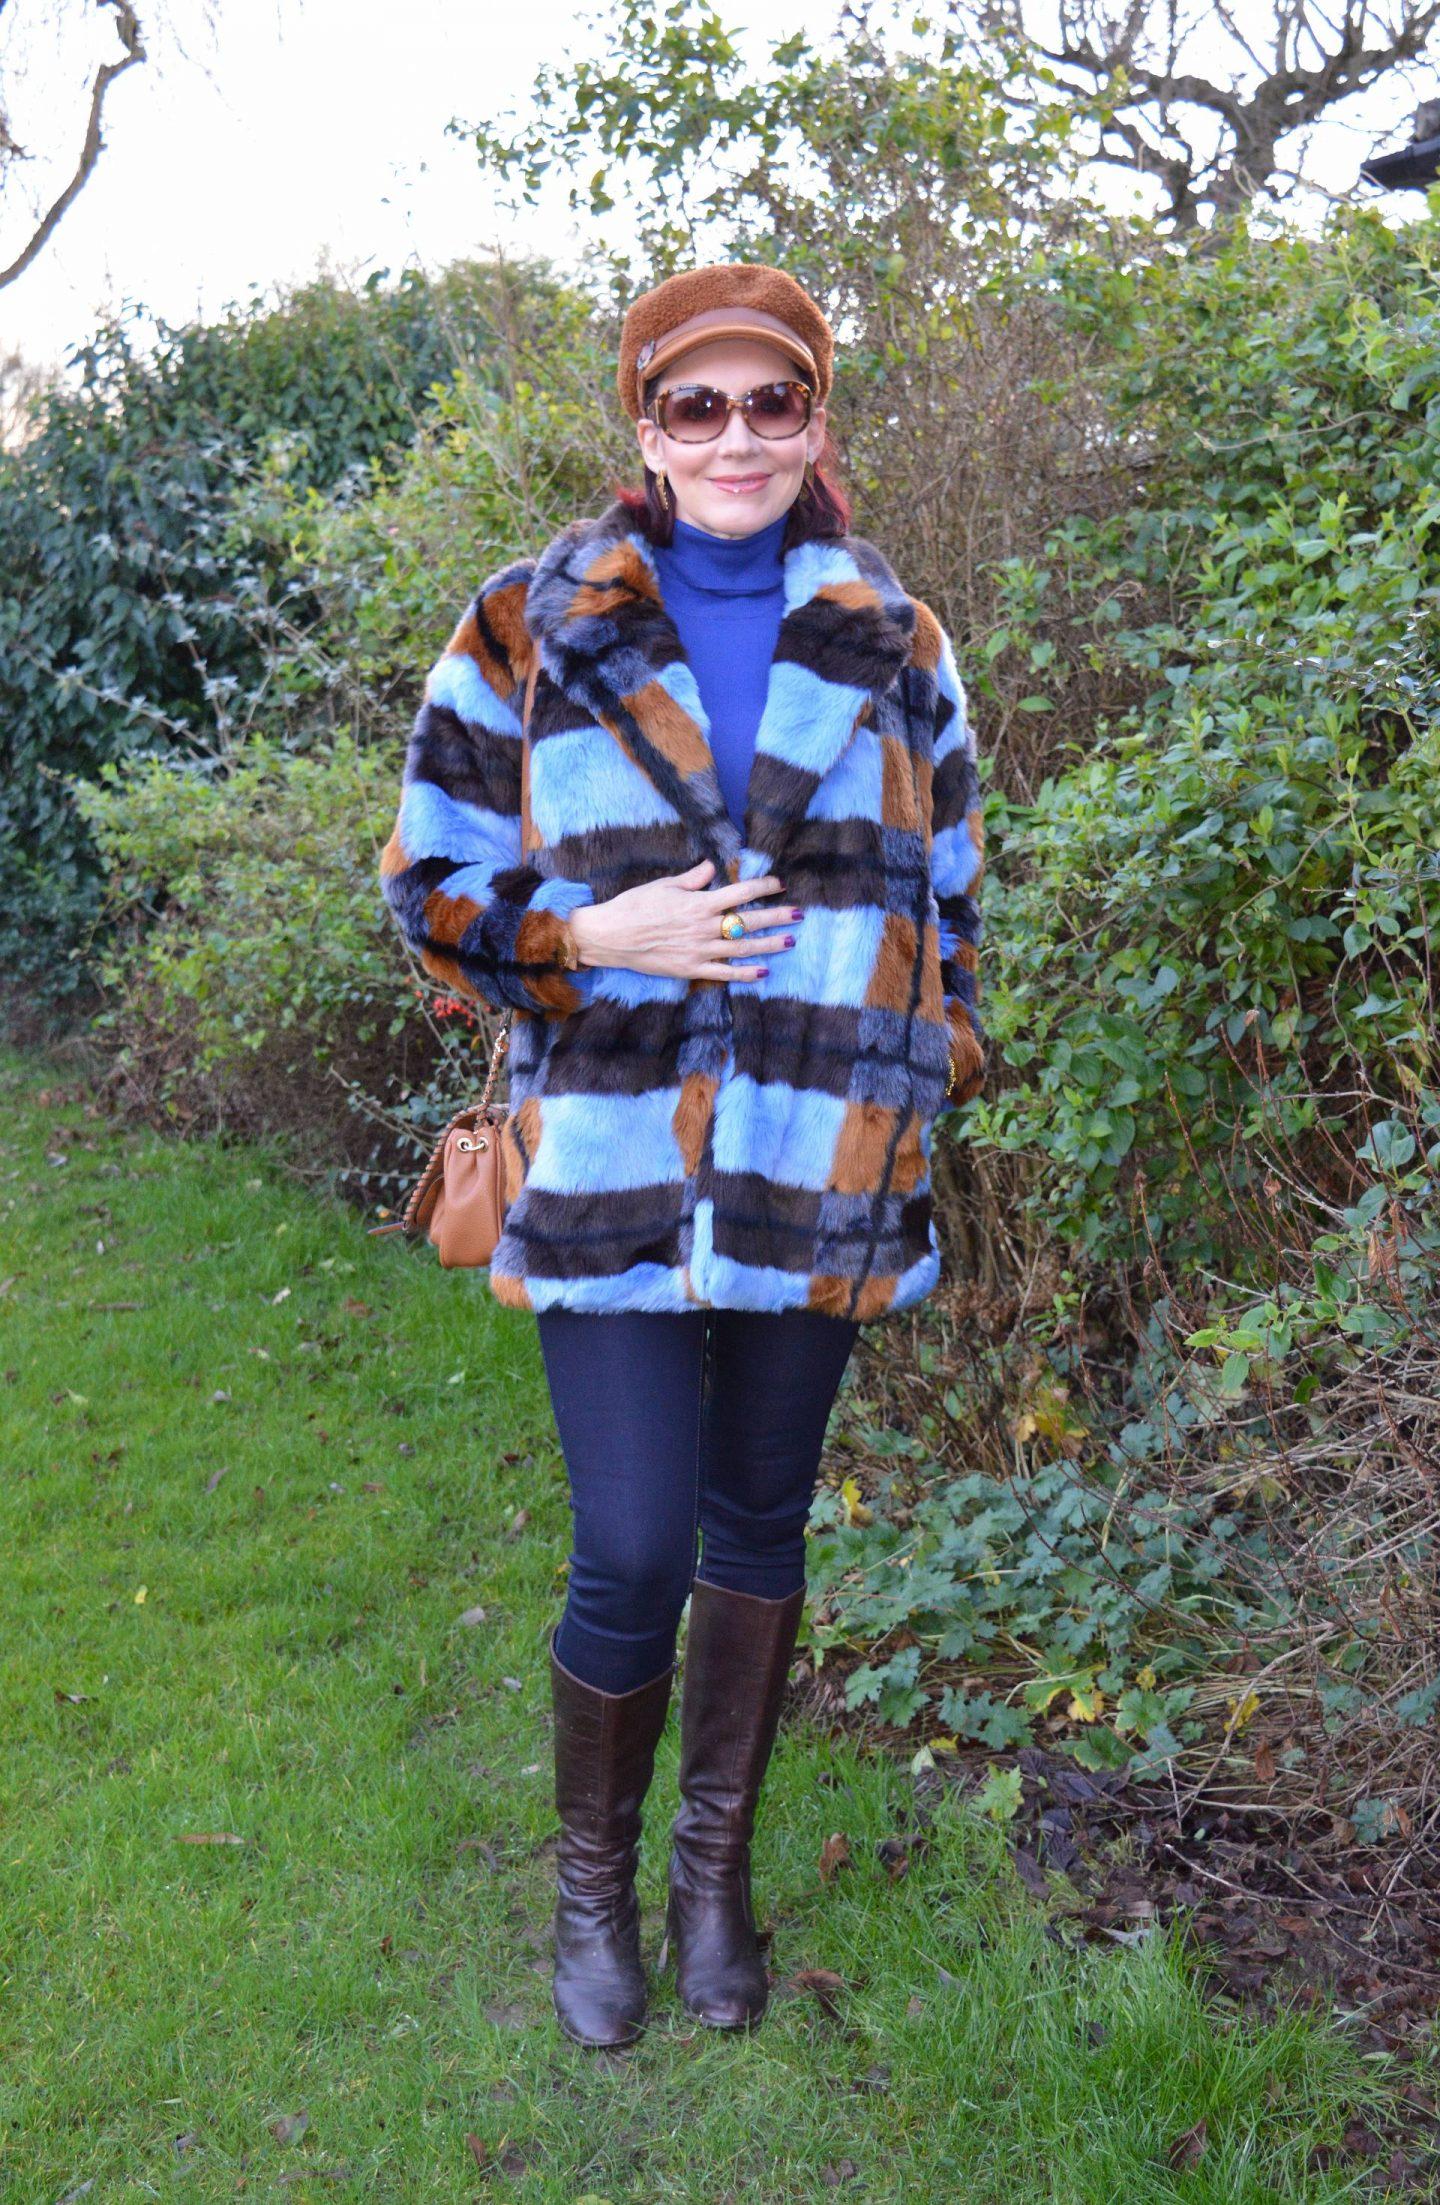 New Year Cozy Chic, Asos faux fur coat, Scottage leopard print bag, Marks & Spencer brown baker boy hat